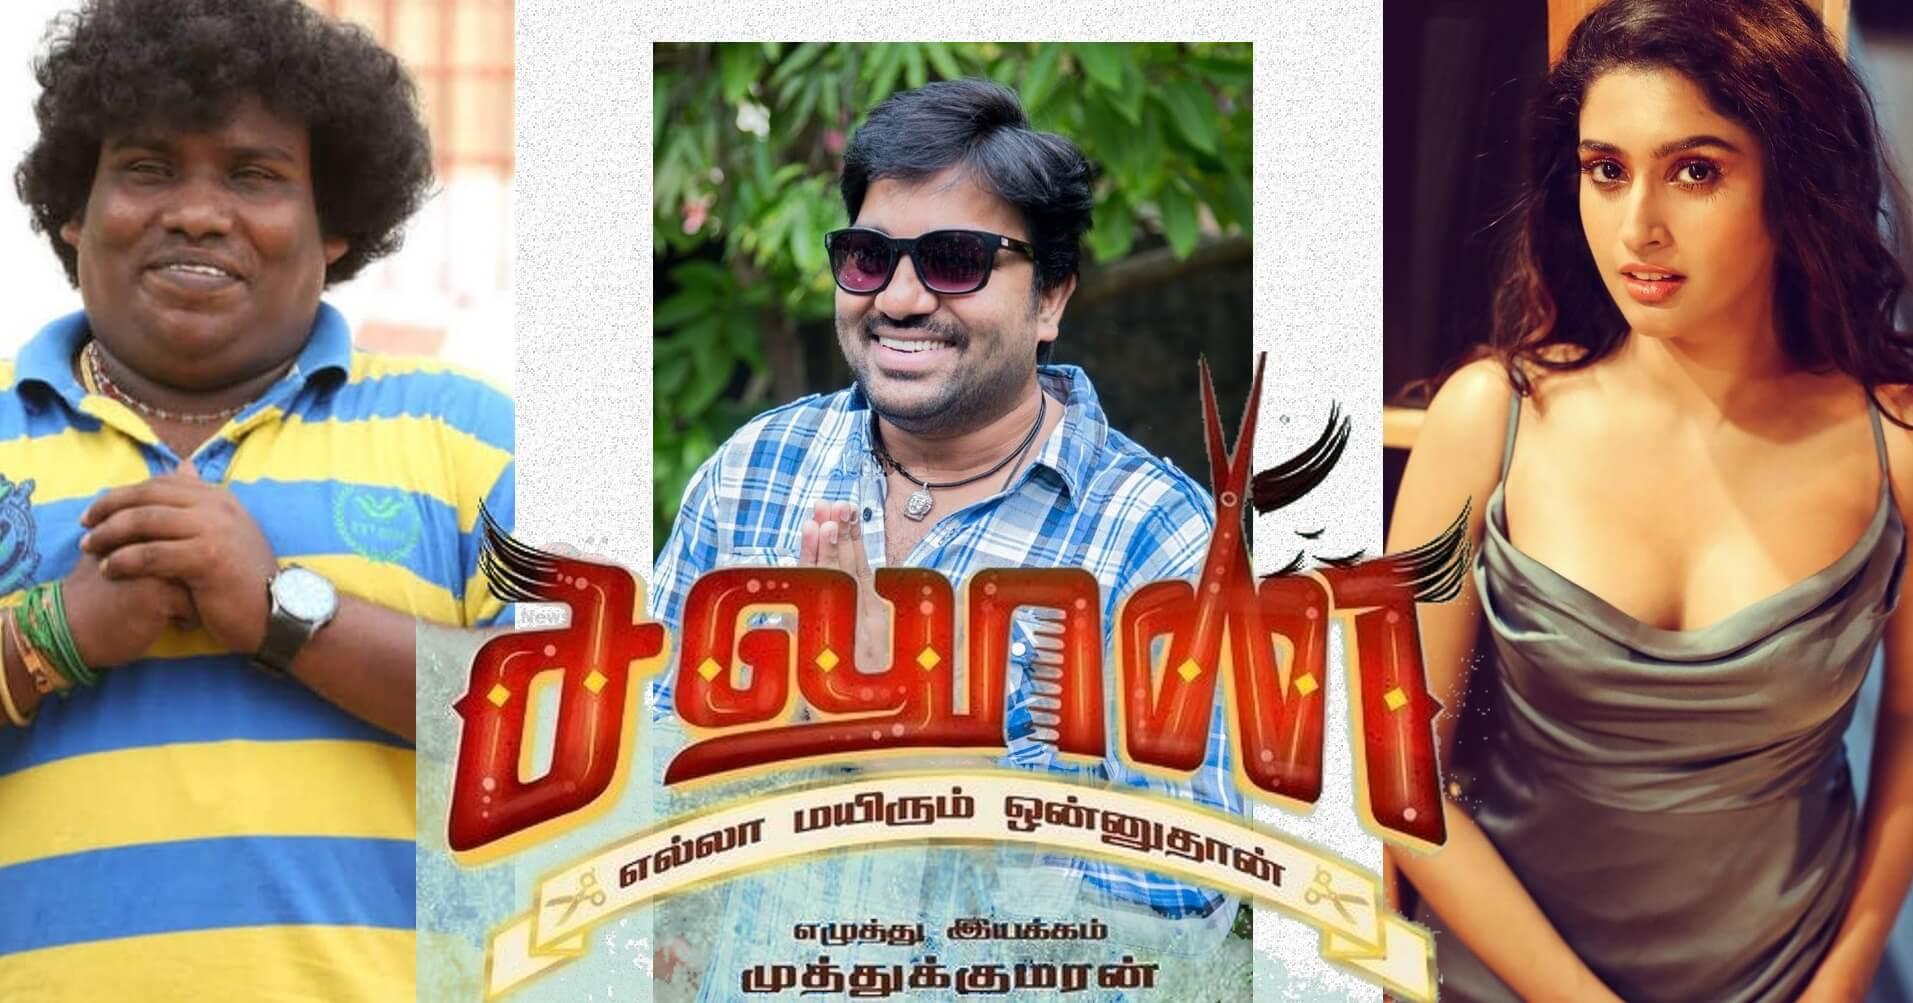 saloon tamil movie